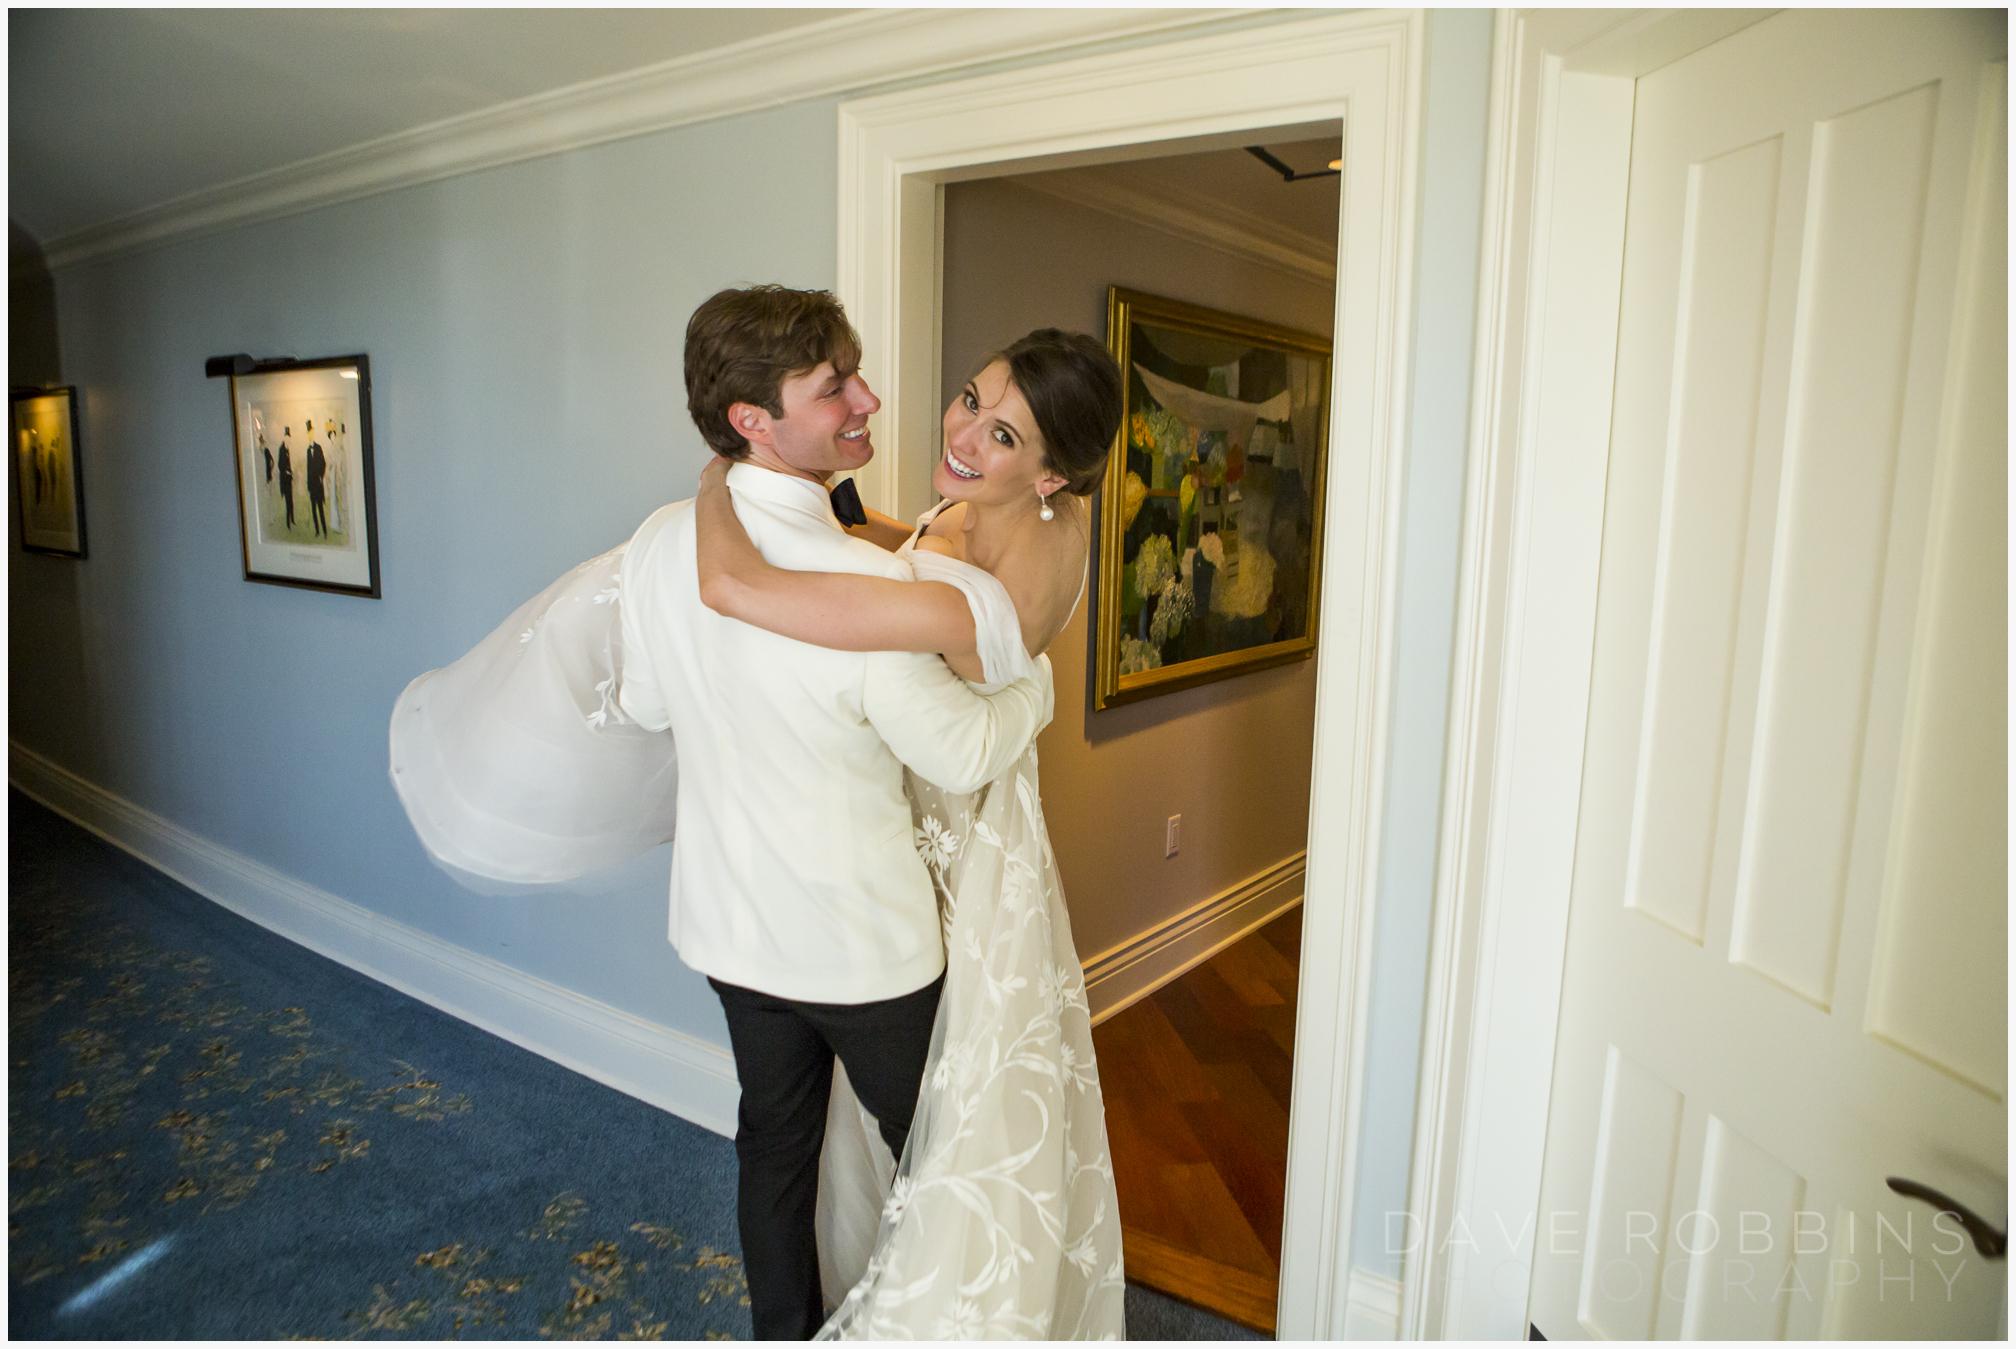 THE OCEAN HOUSE WEDDING 0073.JPG